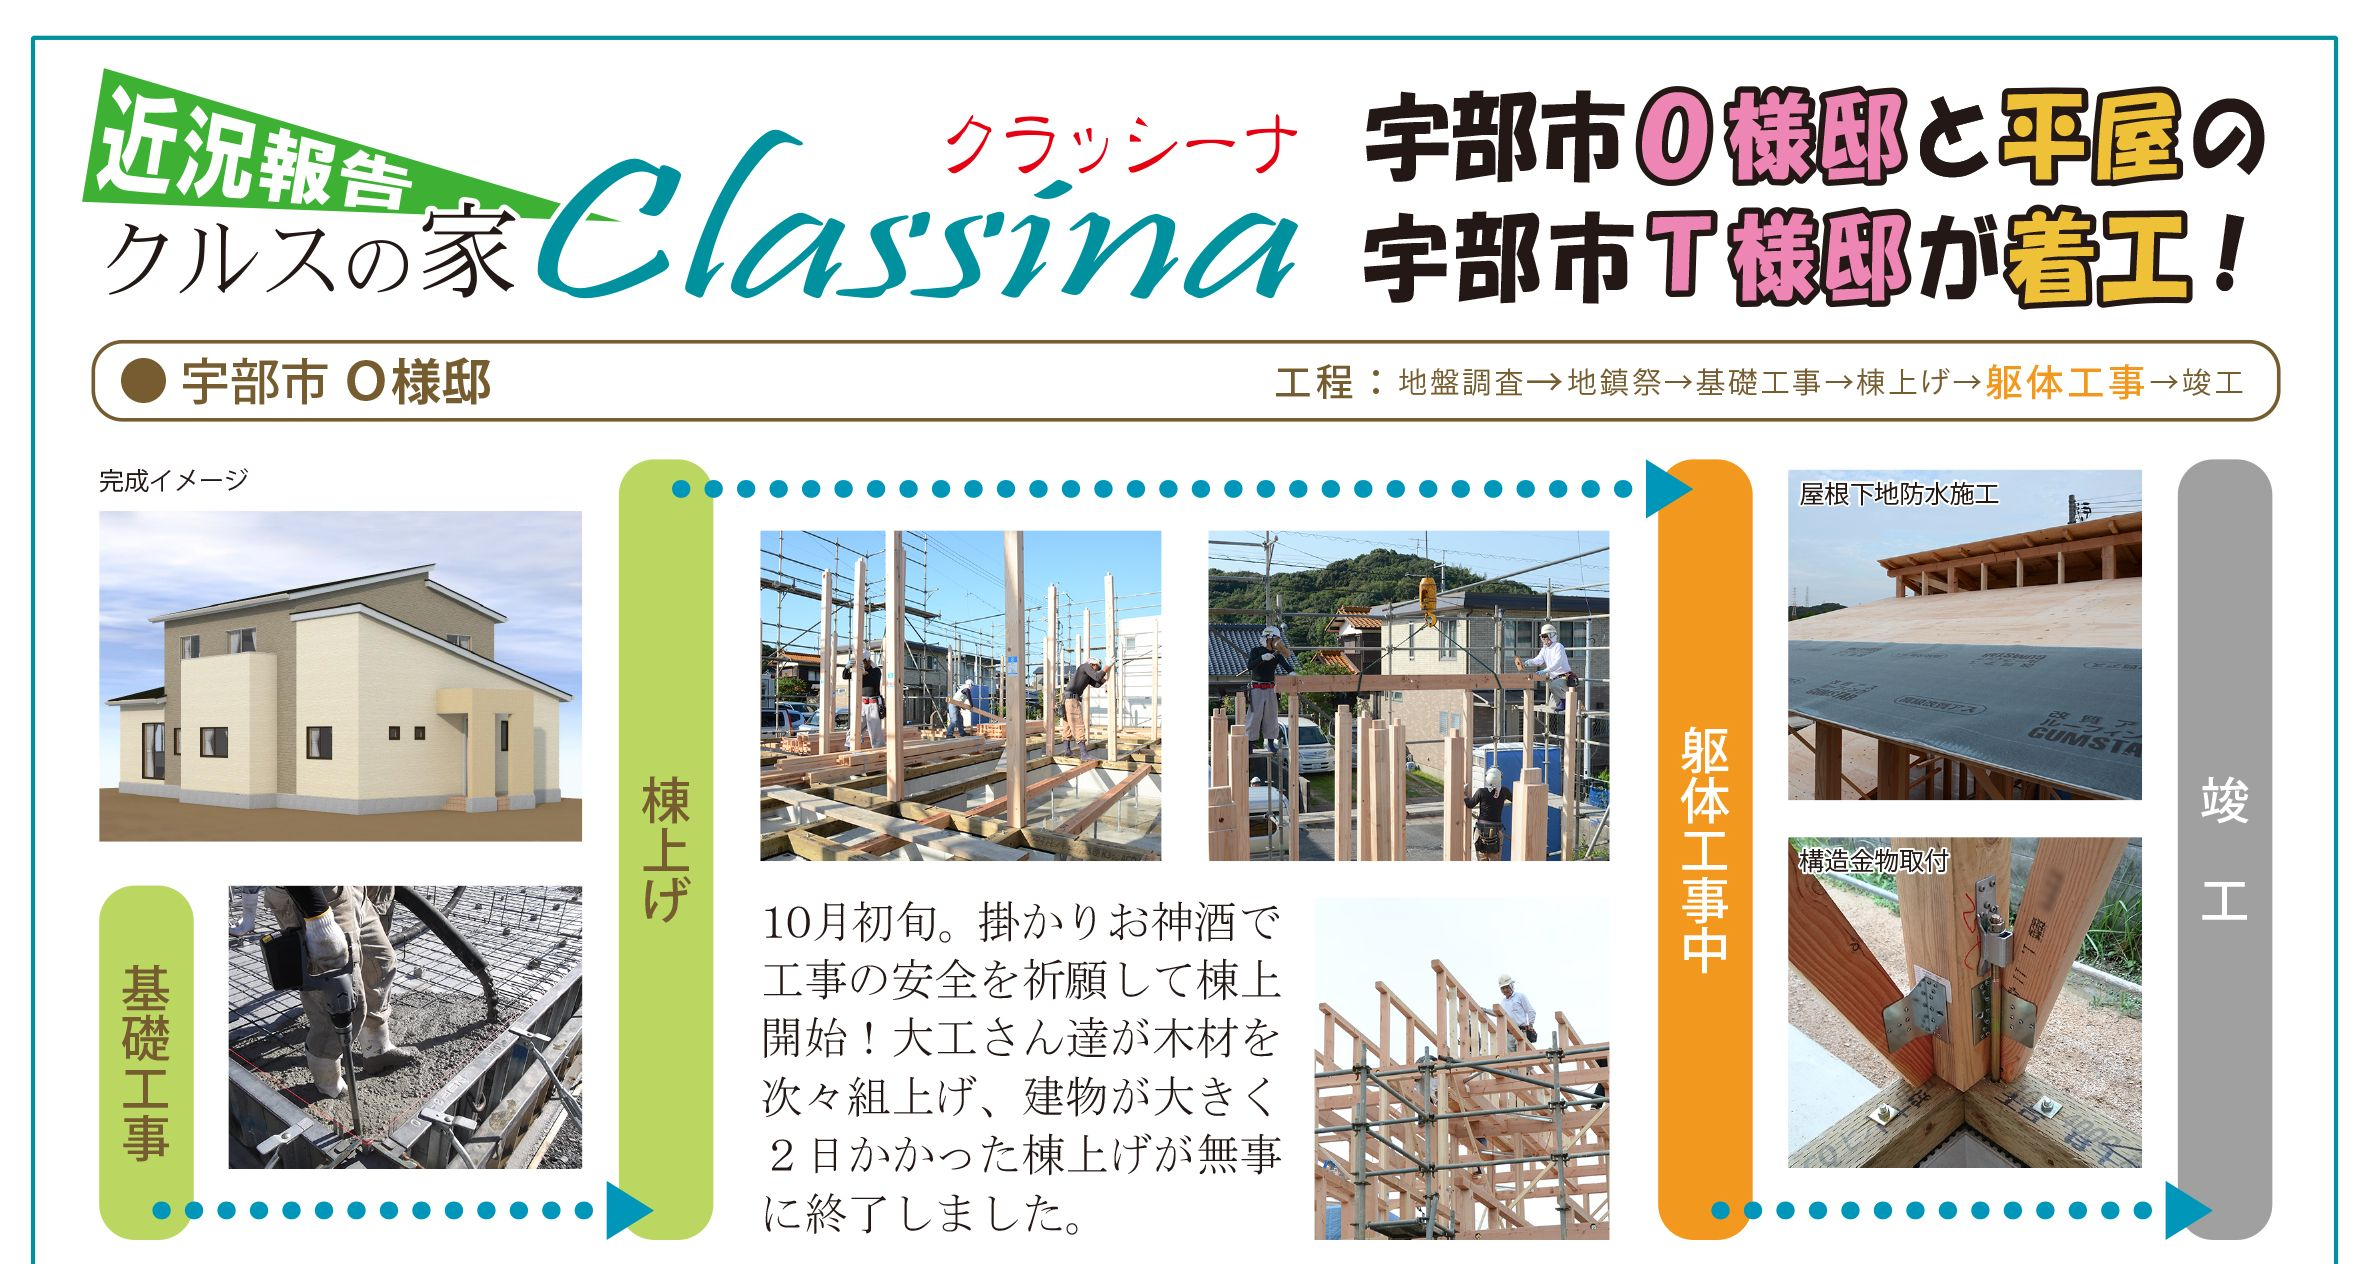 KuraSi-natu-sin101-02.jpg